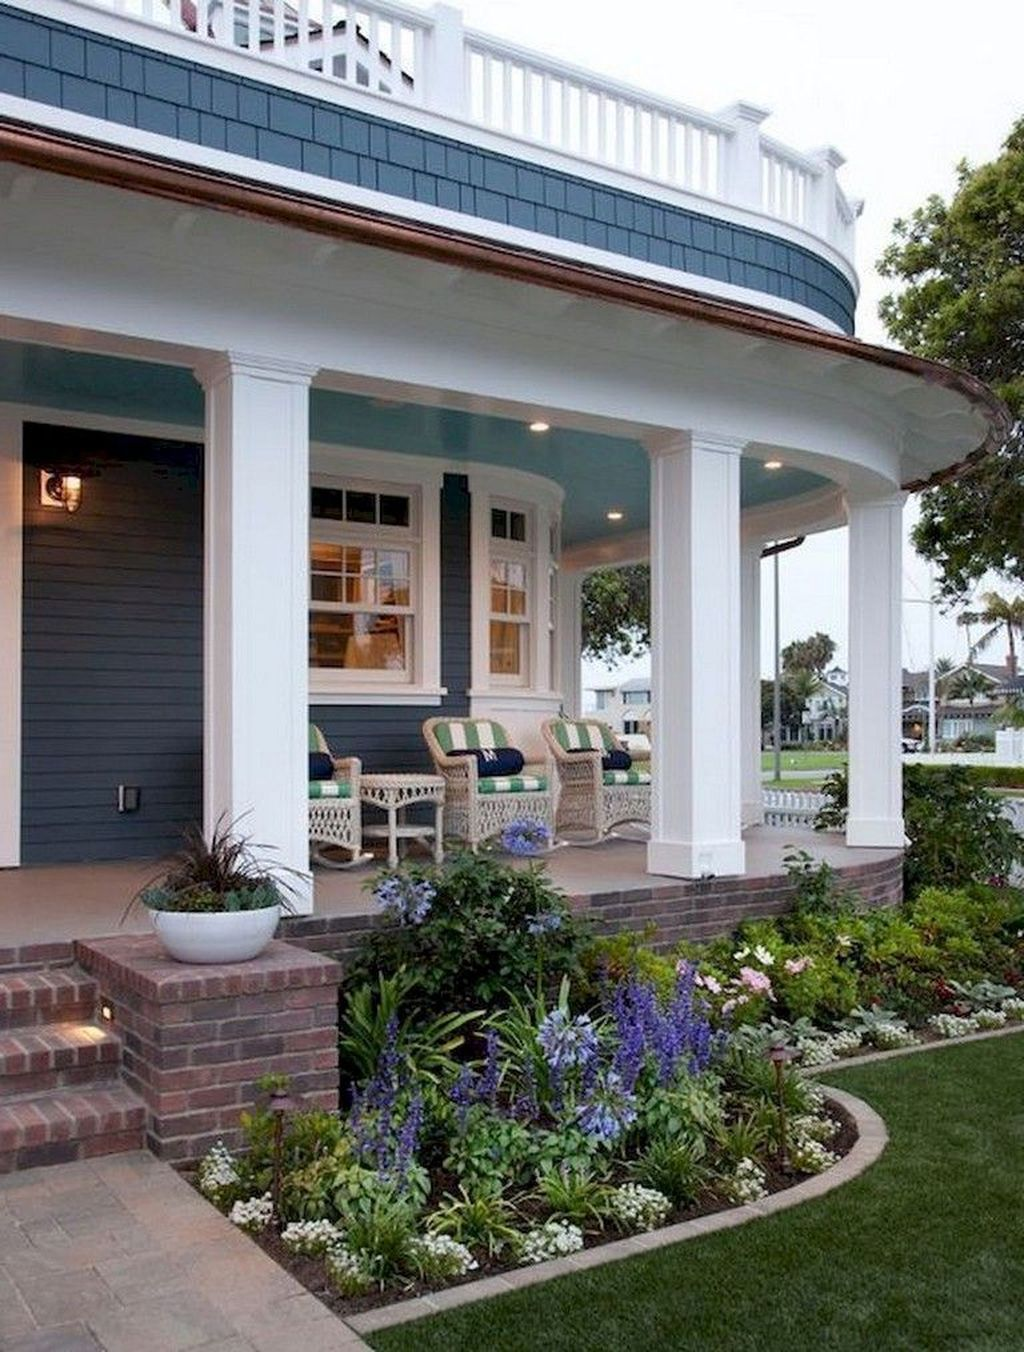 40 Incredible Farmhouse Front Porch Design Ideas Page 10 Of 44